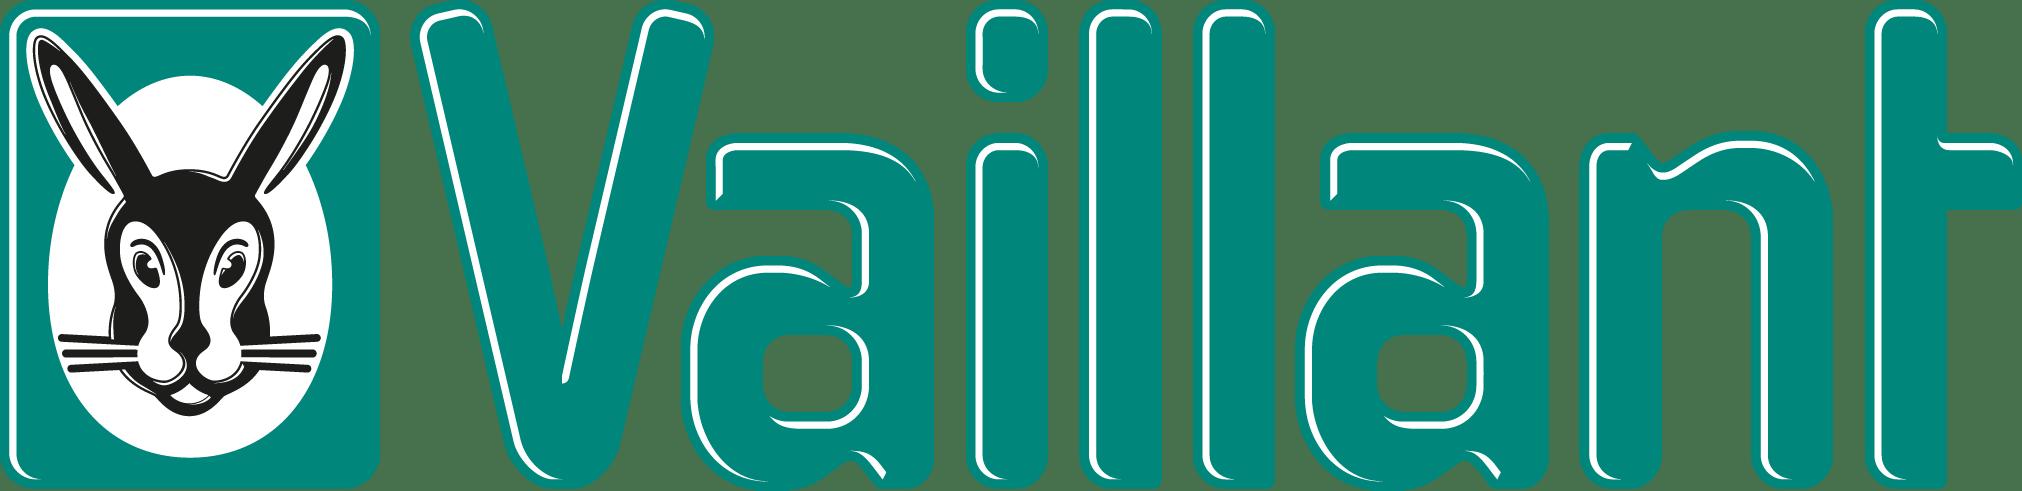 Vaillant Logo png